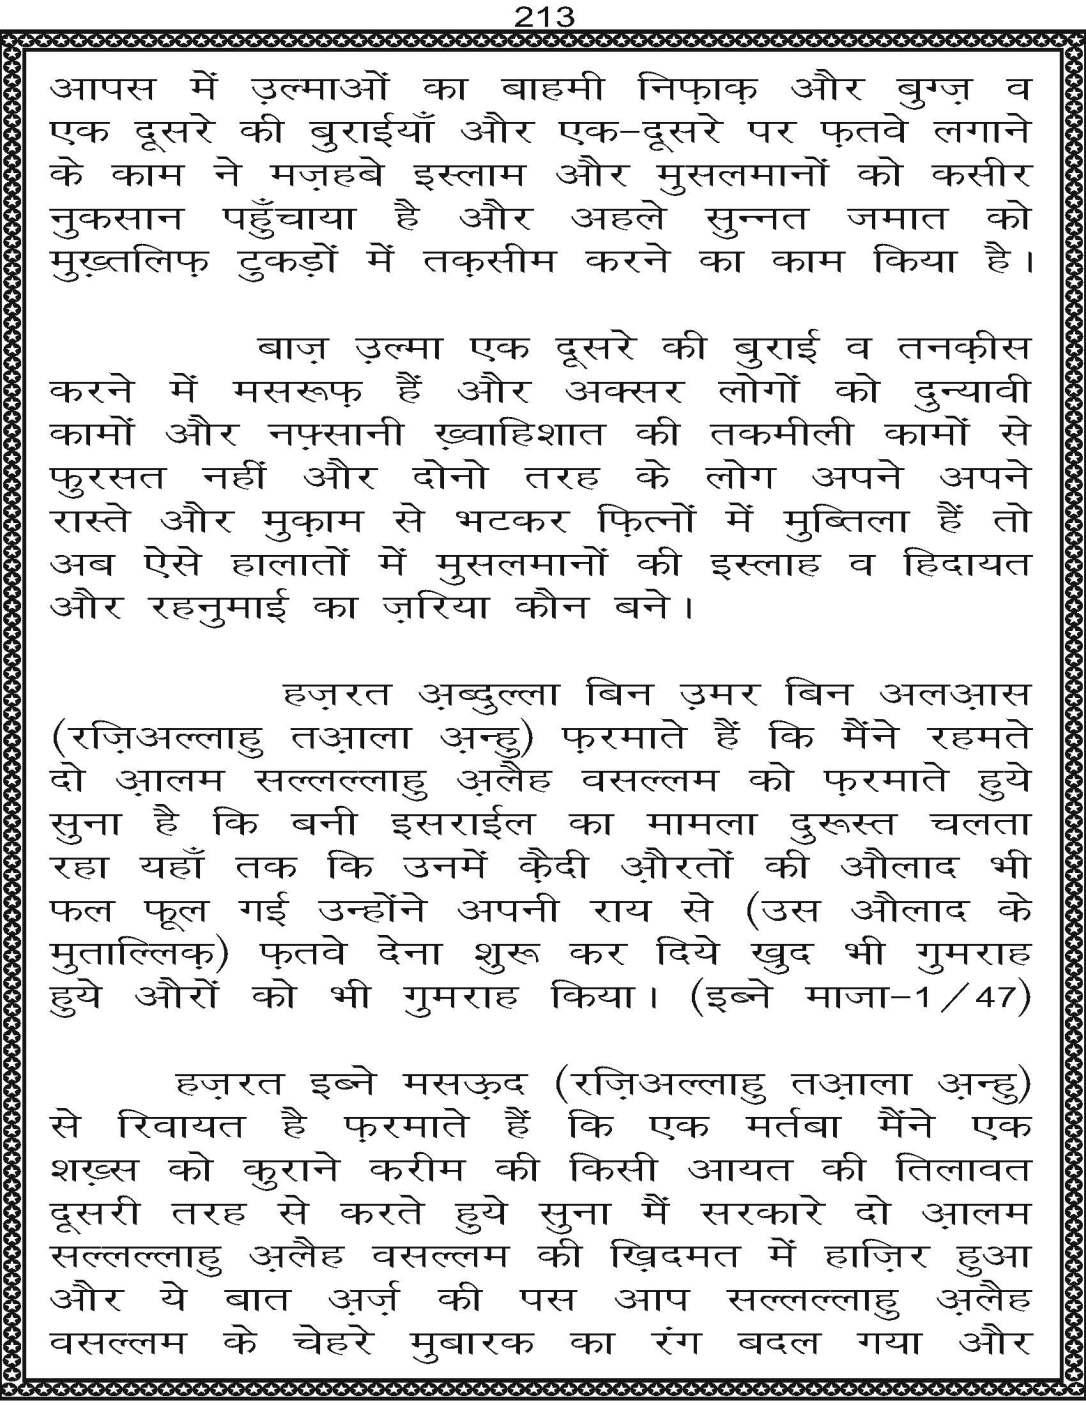 AzmateTaziyadari_Page_213